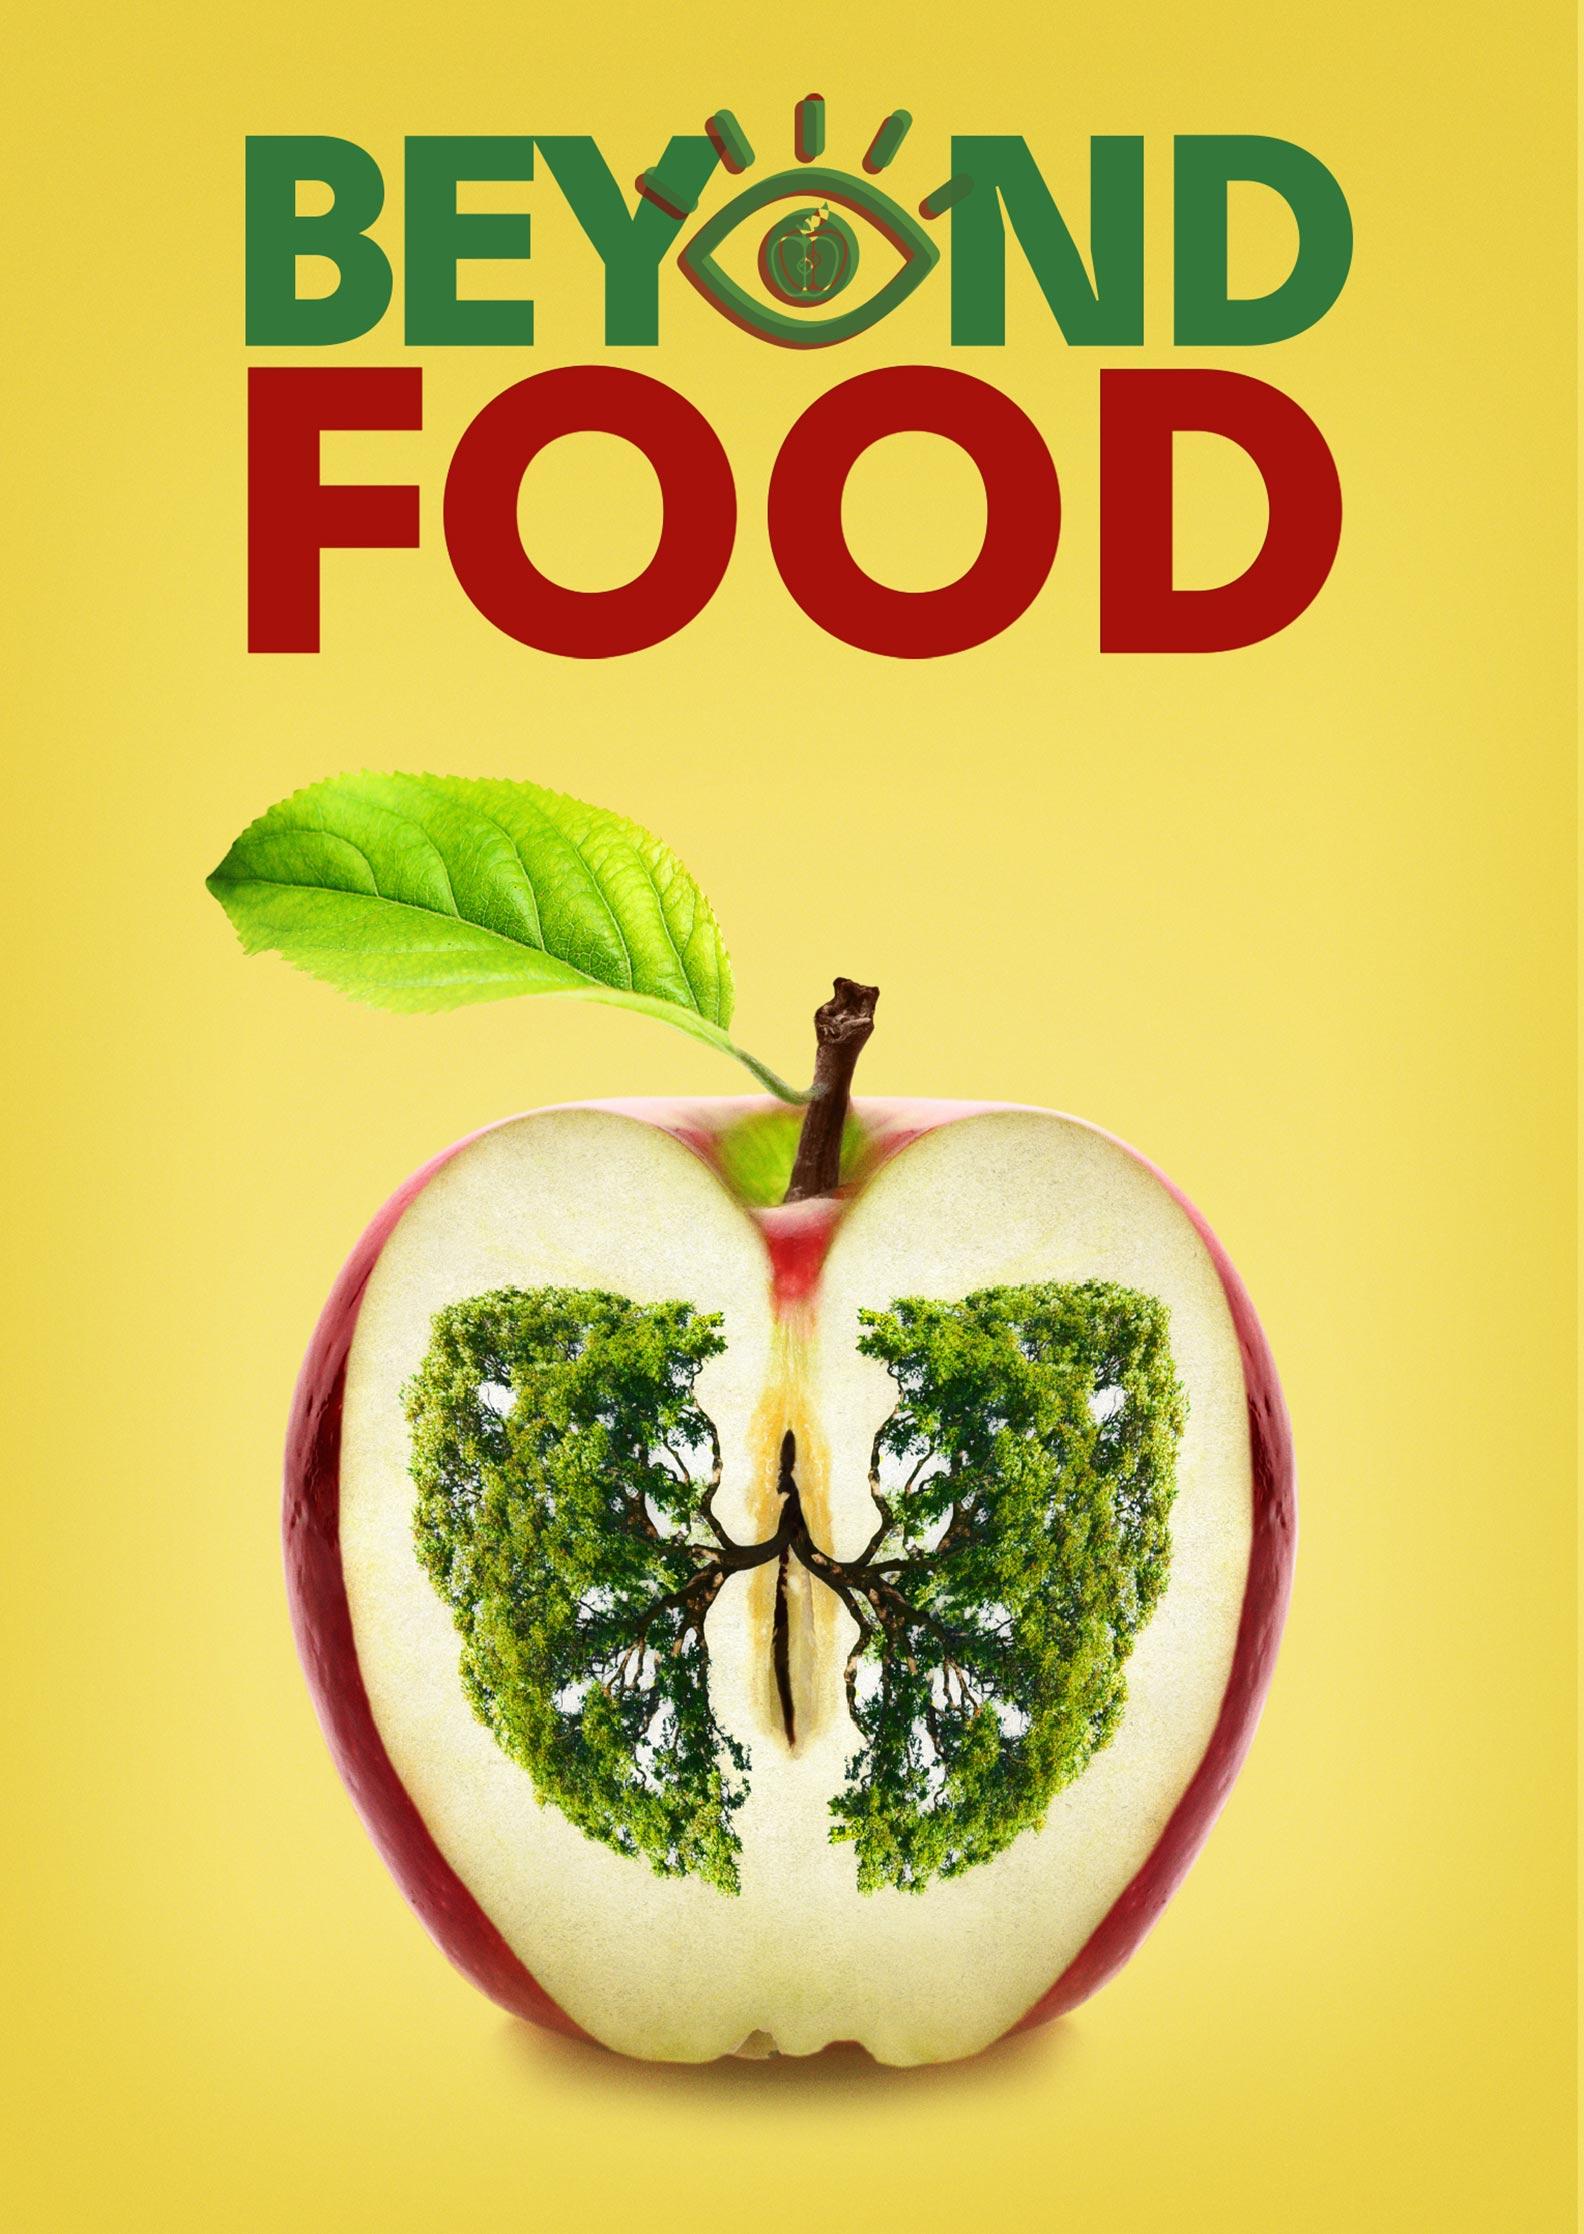 Beyond Food Poster #1